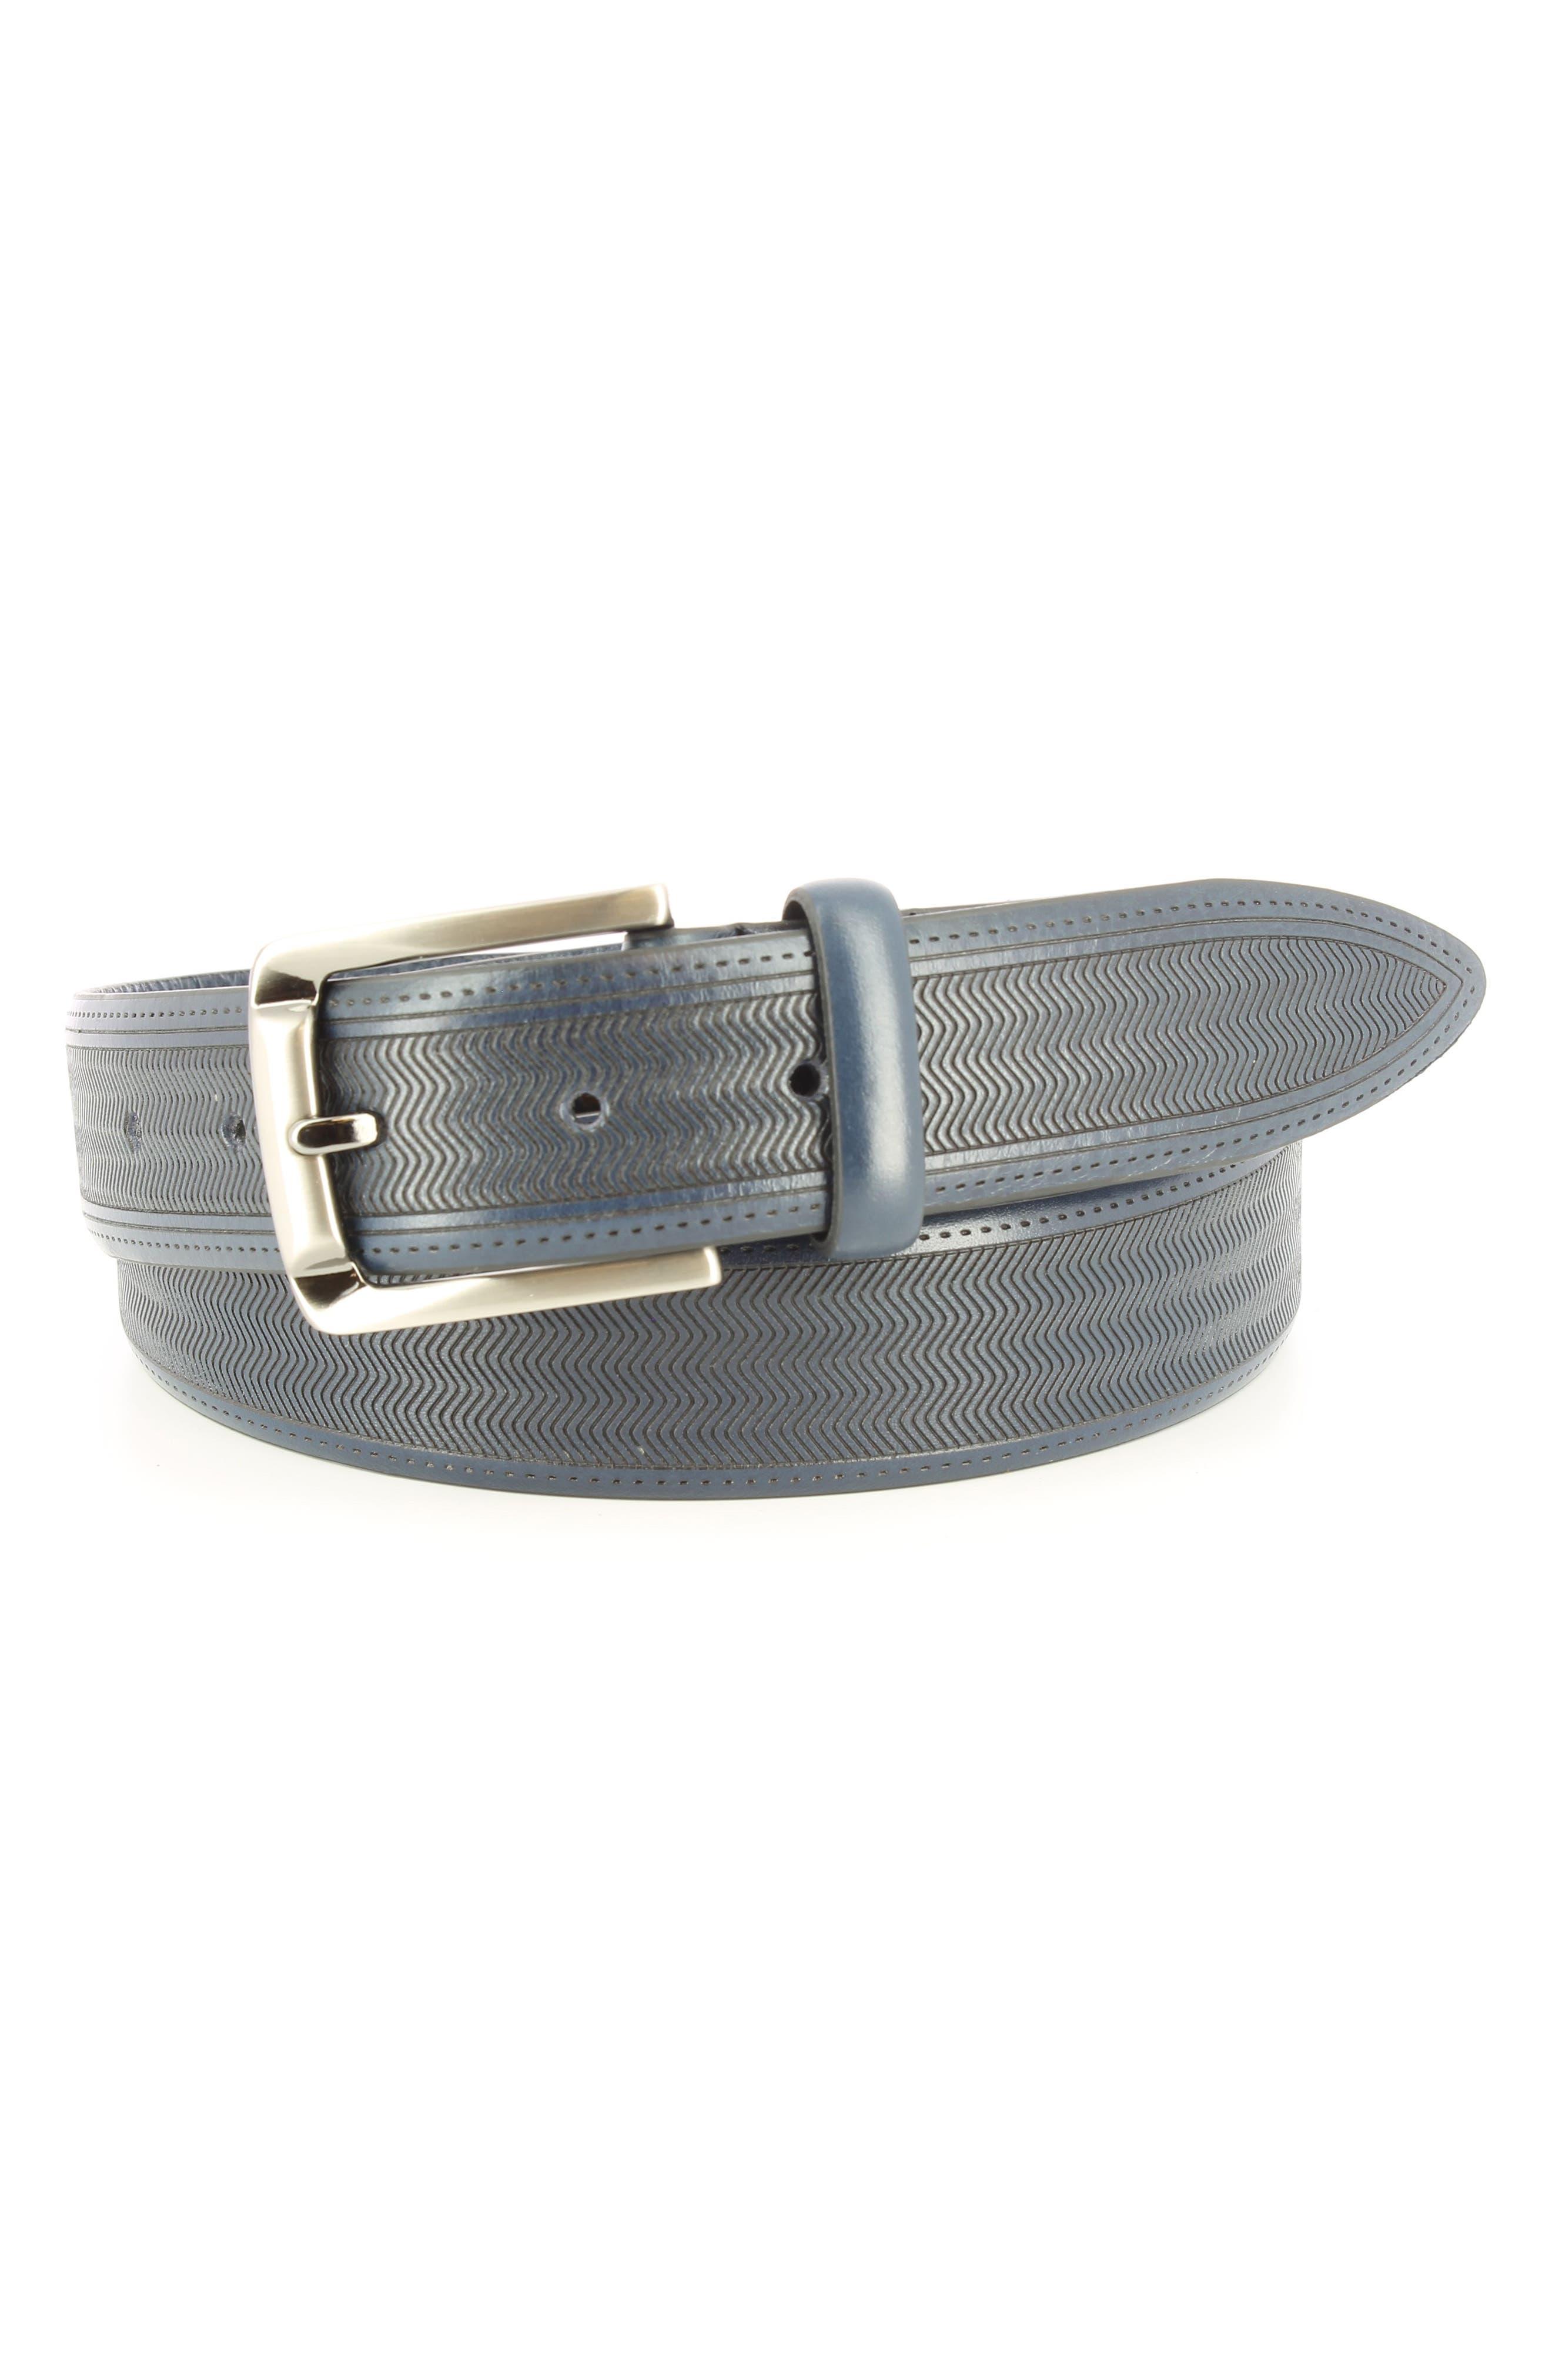 Raspail Leather Belt,                         Main,                         color, Navy